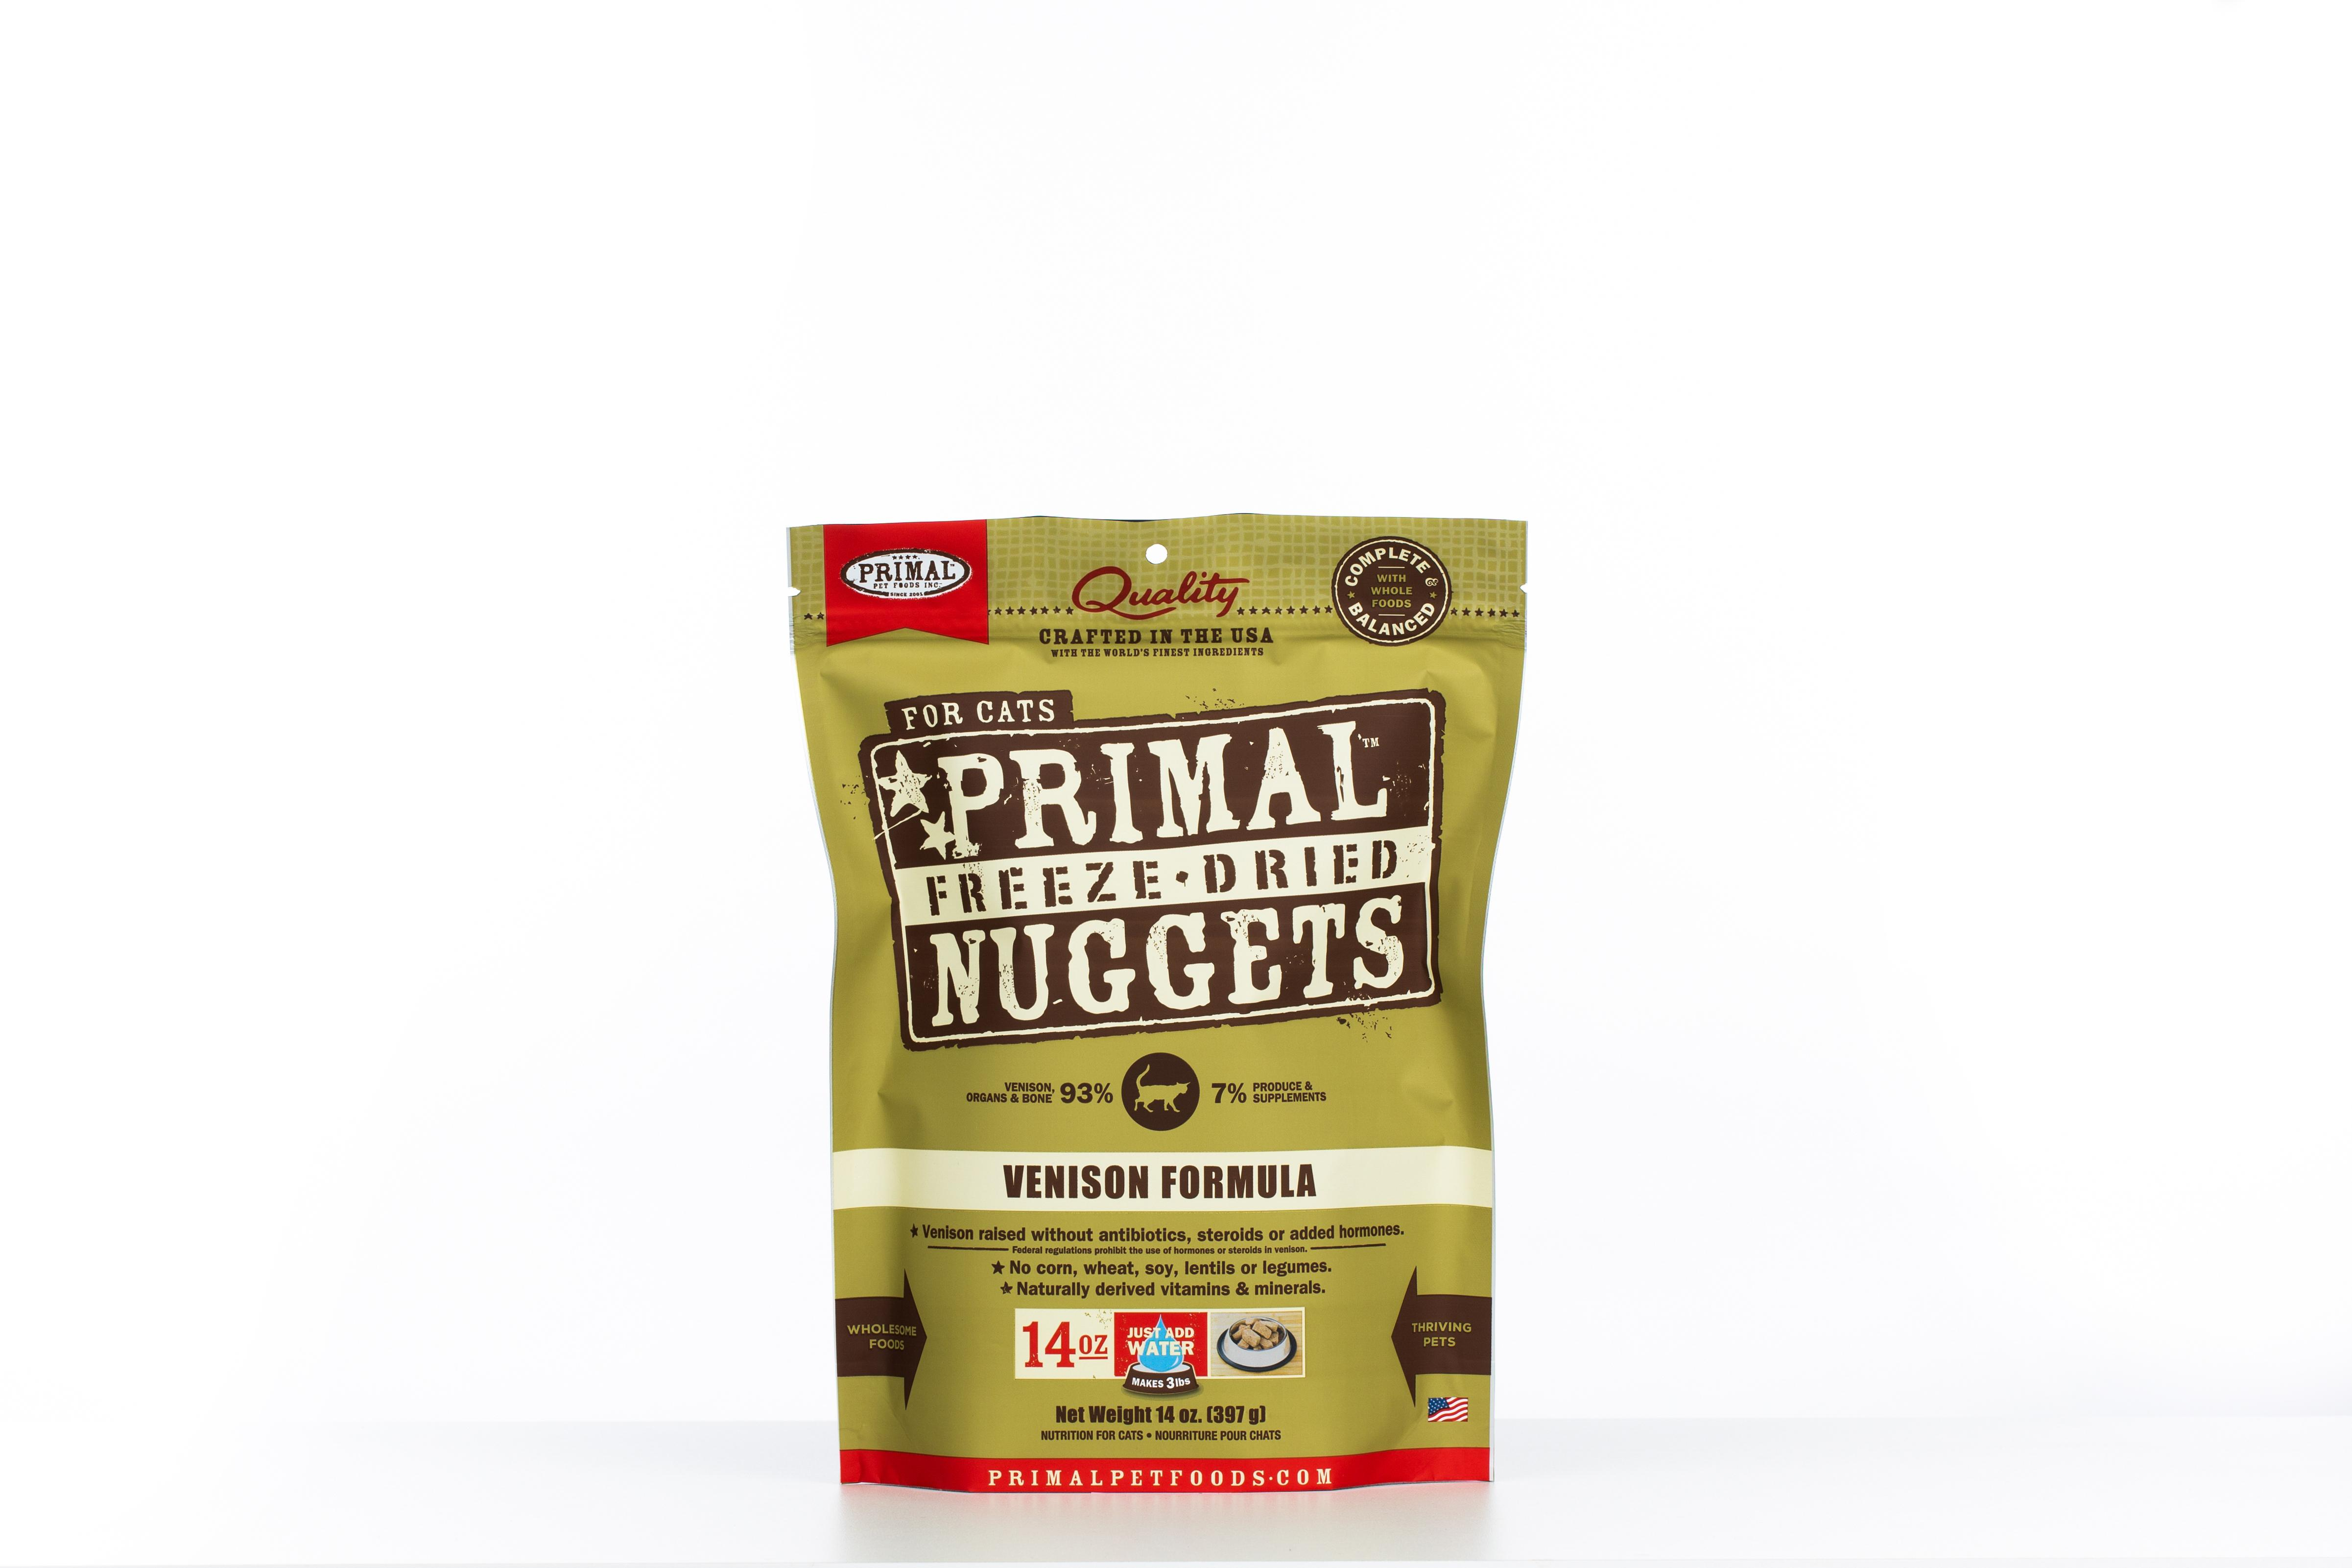 Primal Raw Freeze-Dried Nuggets Venison Formula Cat Food, 14-oz bag